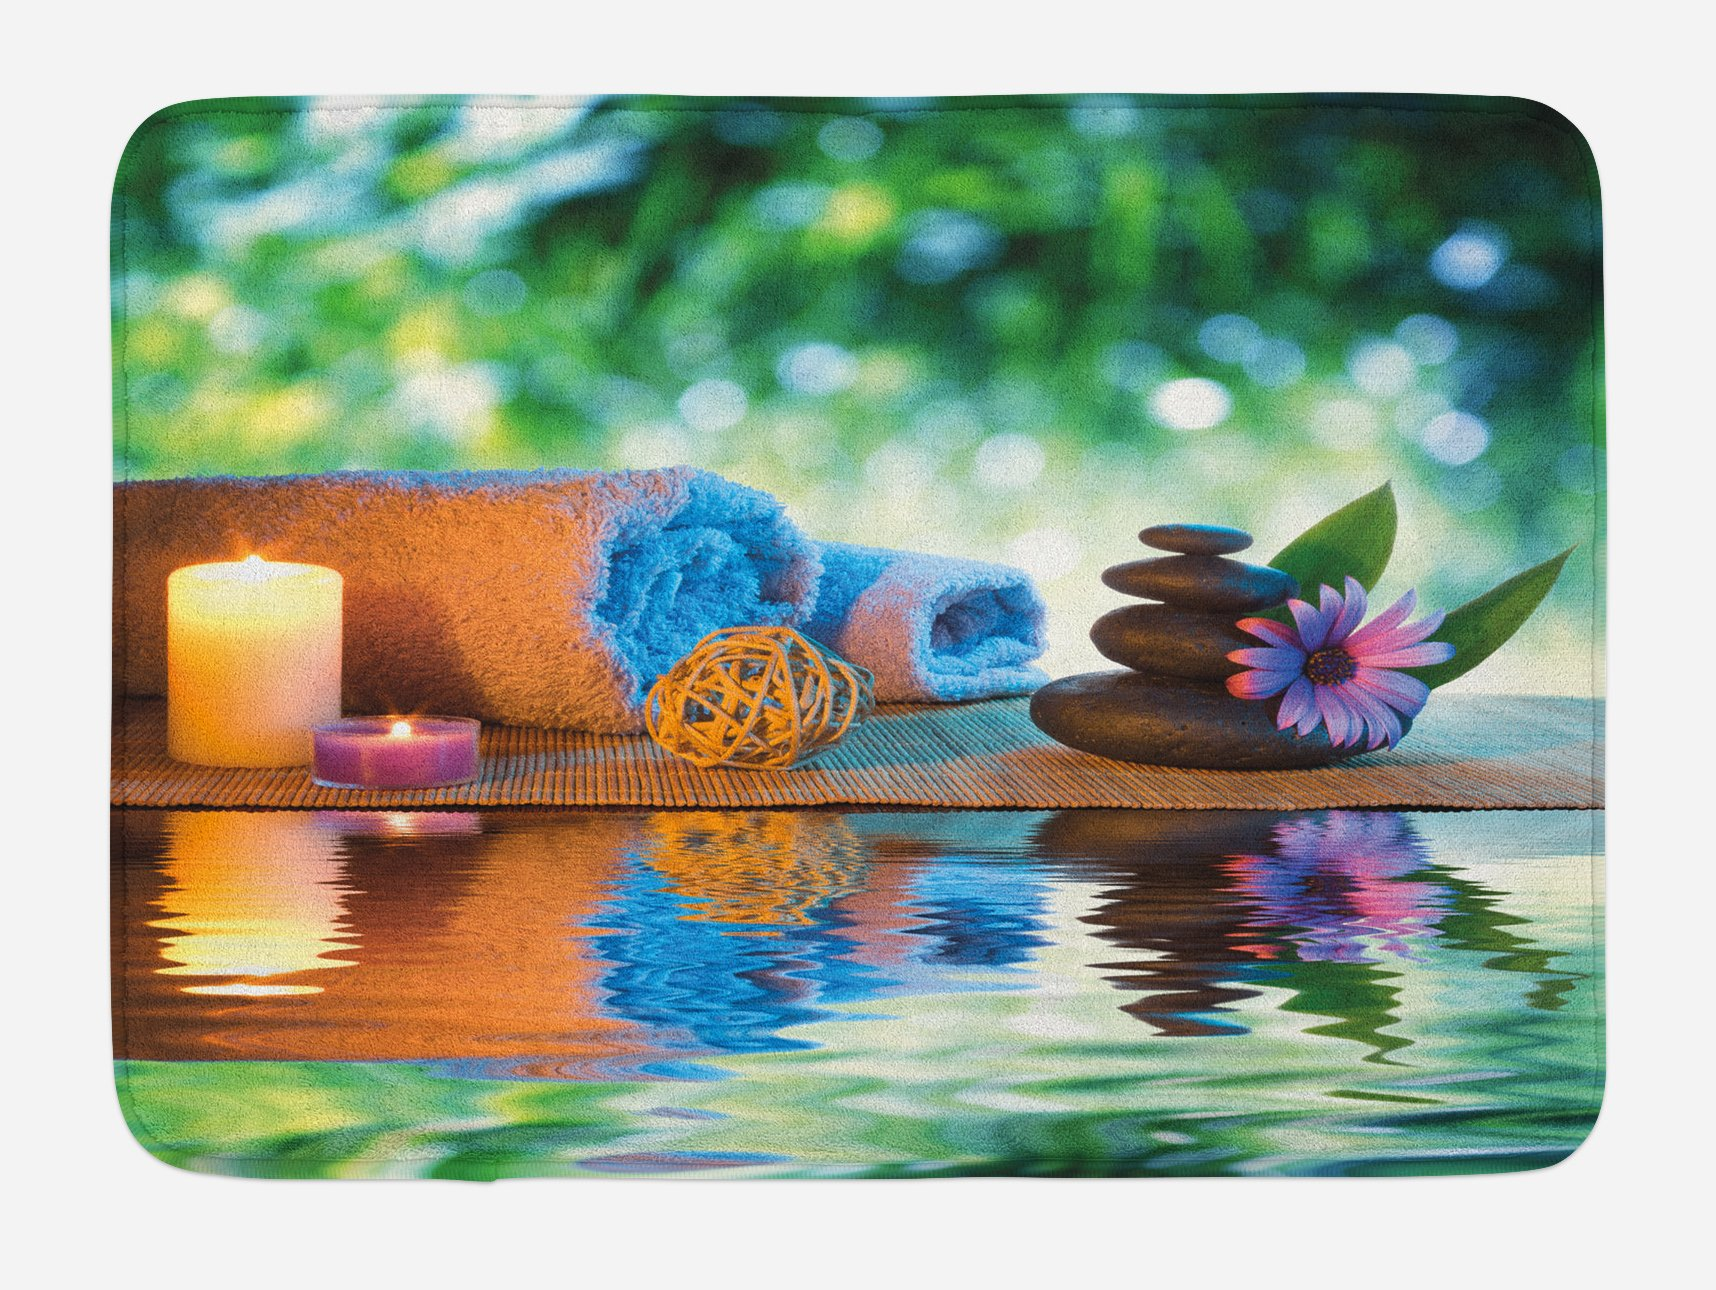 Lunarable Spa Bath Mat, Asian Culture Inspiration Chinese Japanese Candles Zen Meditation Stones, Plush Bathroom Decor Mat with Non Slip Backing, 29.5 W X 17.5 W Inches, Green Orange Lavander